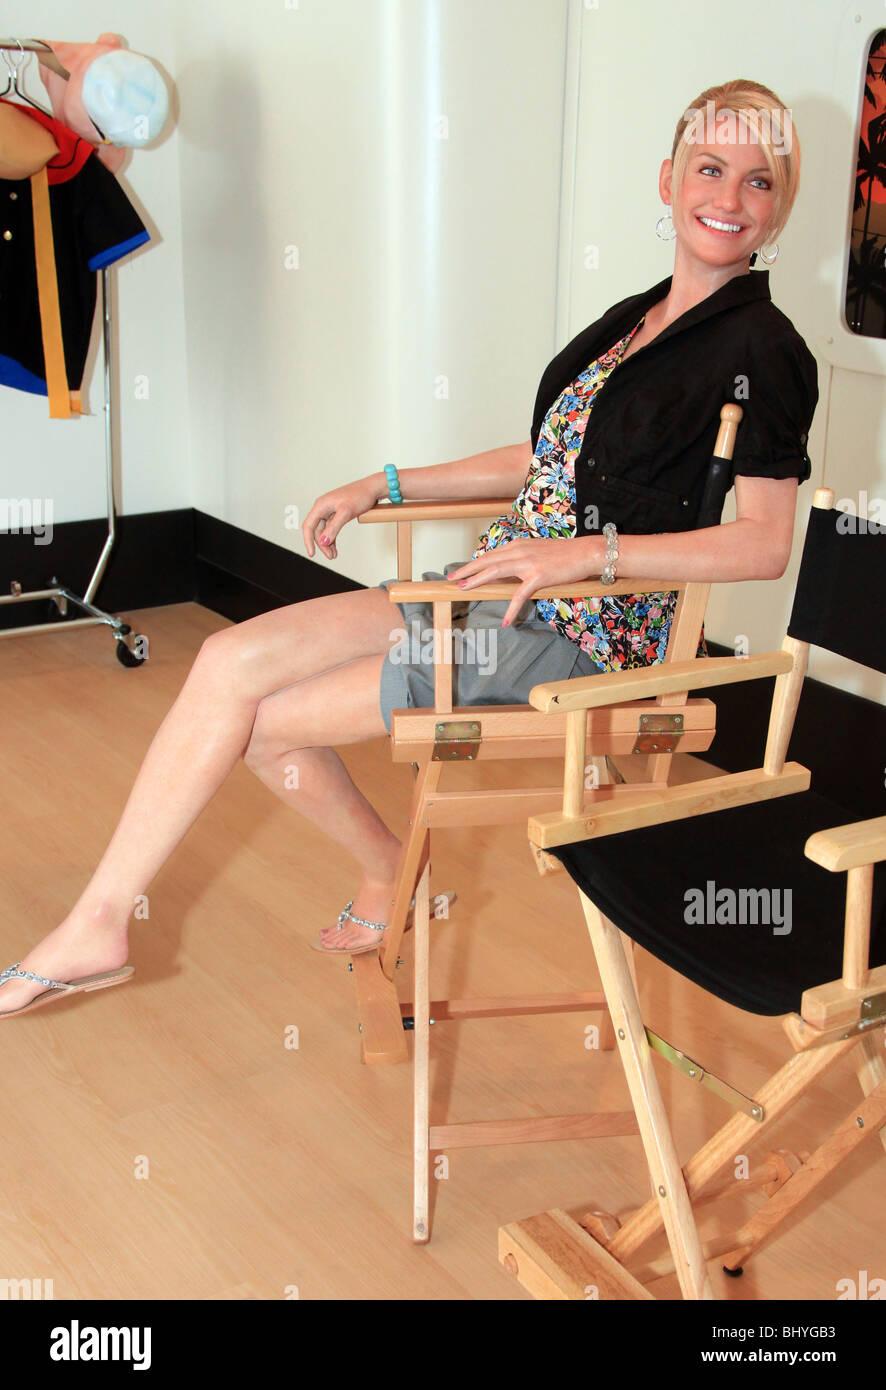 CAMERON DIAZ (WAXWORK) MADAM TUSSAUDS HOLLYWOOD OPENING HOLLYWOOD LOS ANGELES CA USA 21 July 2009 - Stock Image